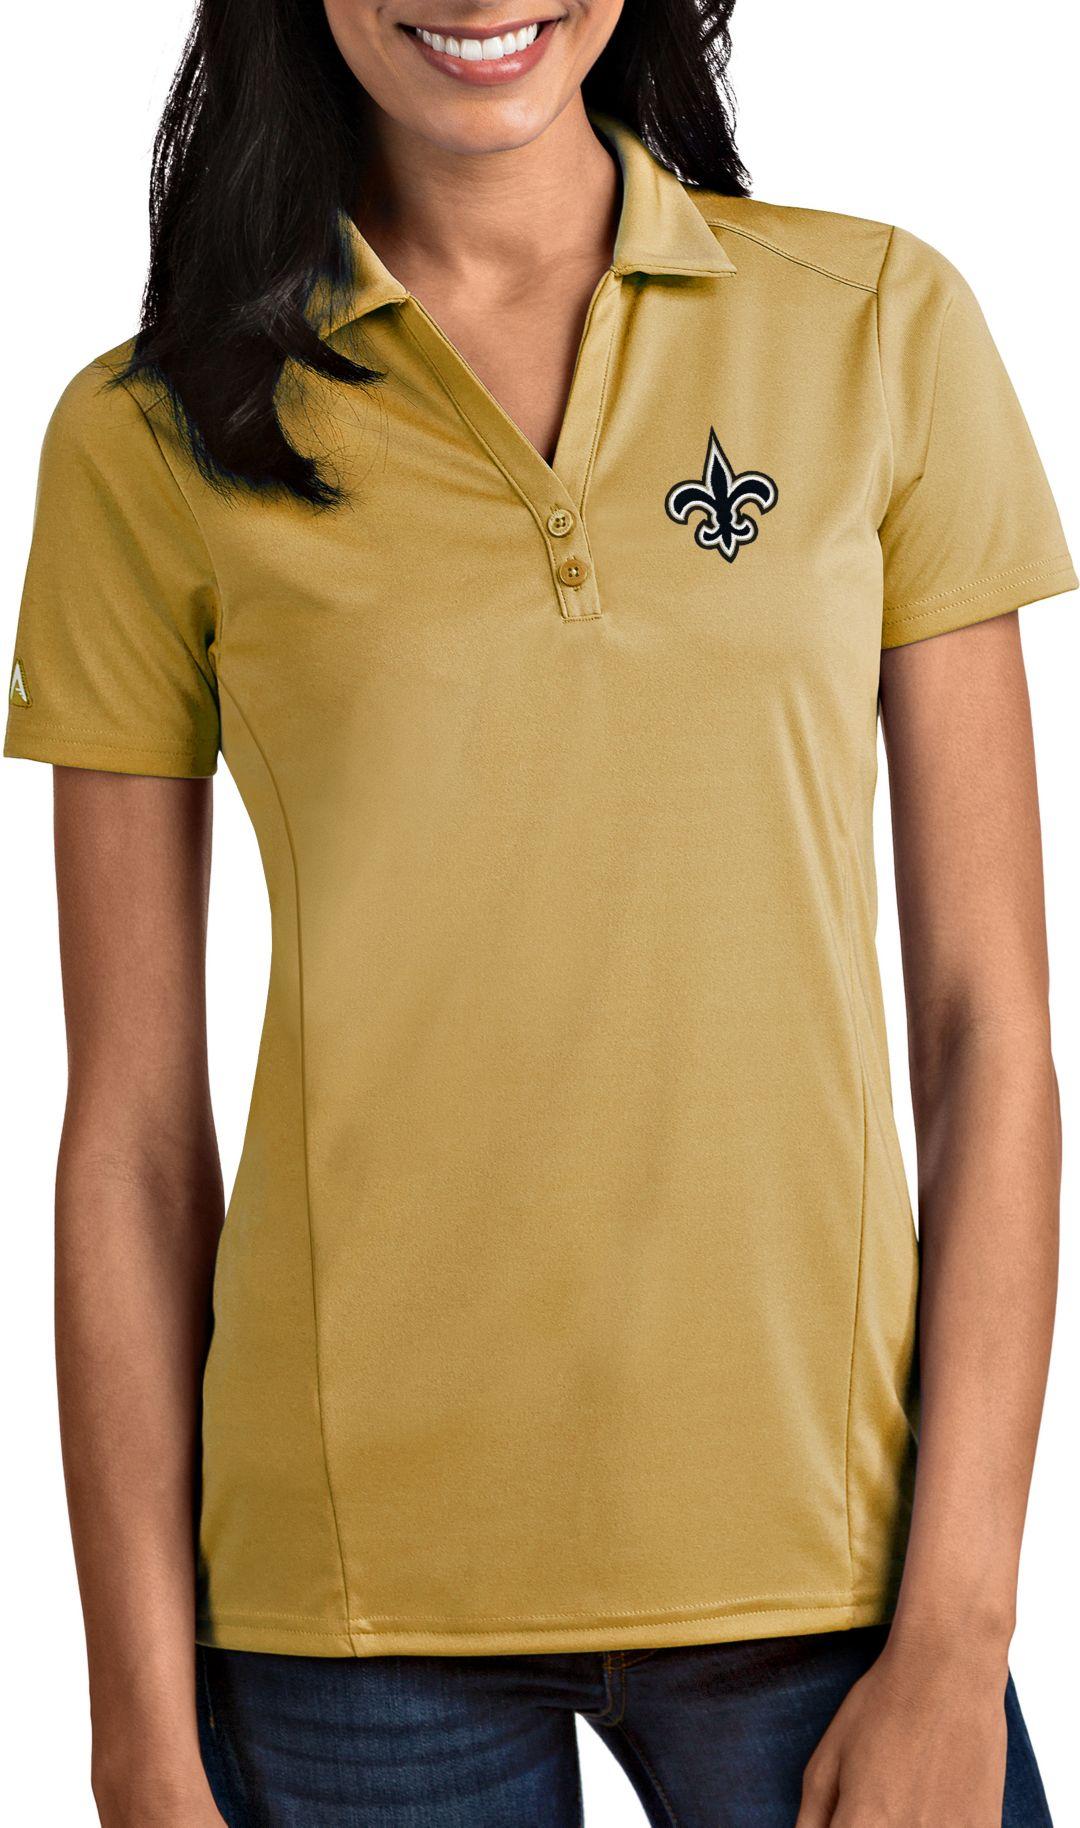 c5f0213f Antigua Women's New Orleans Saints Tribute Gold Polo